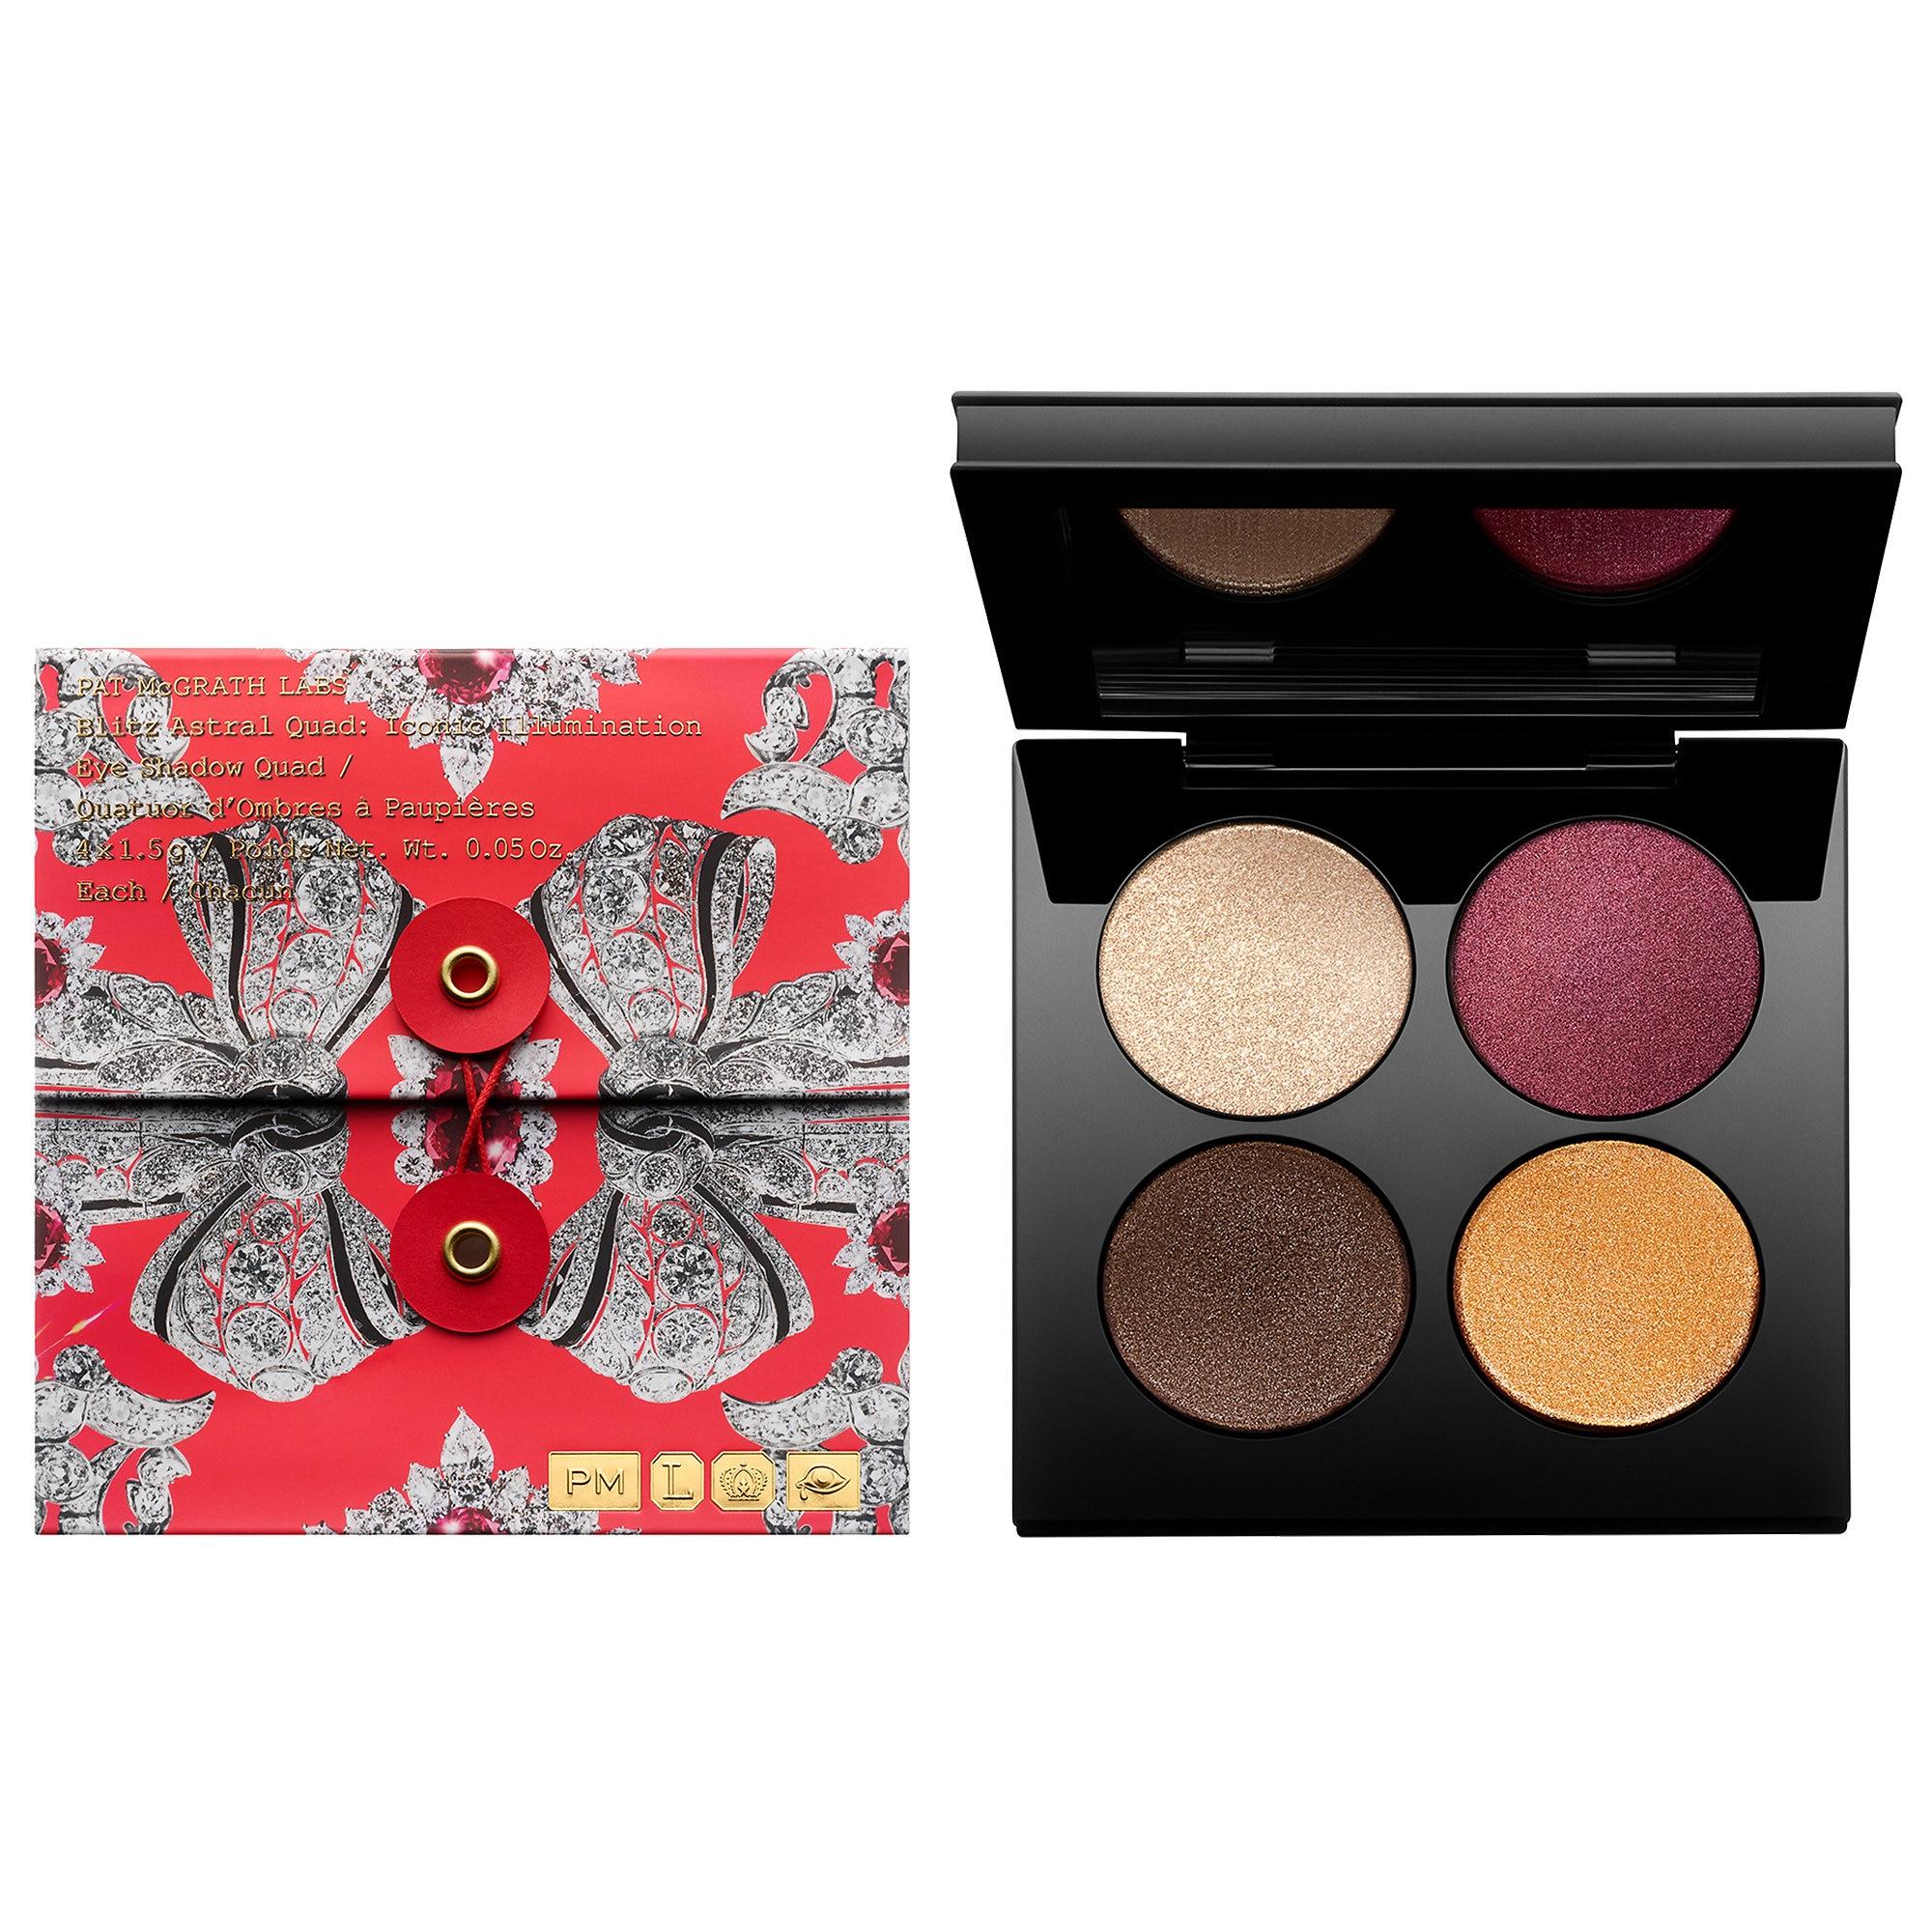 Pat McGrath Labs - Blitz Astral Quad Eyeshadow Palette